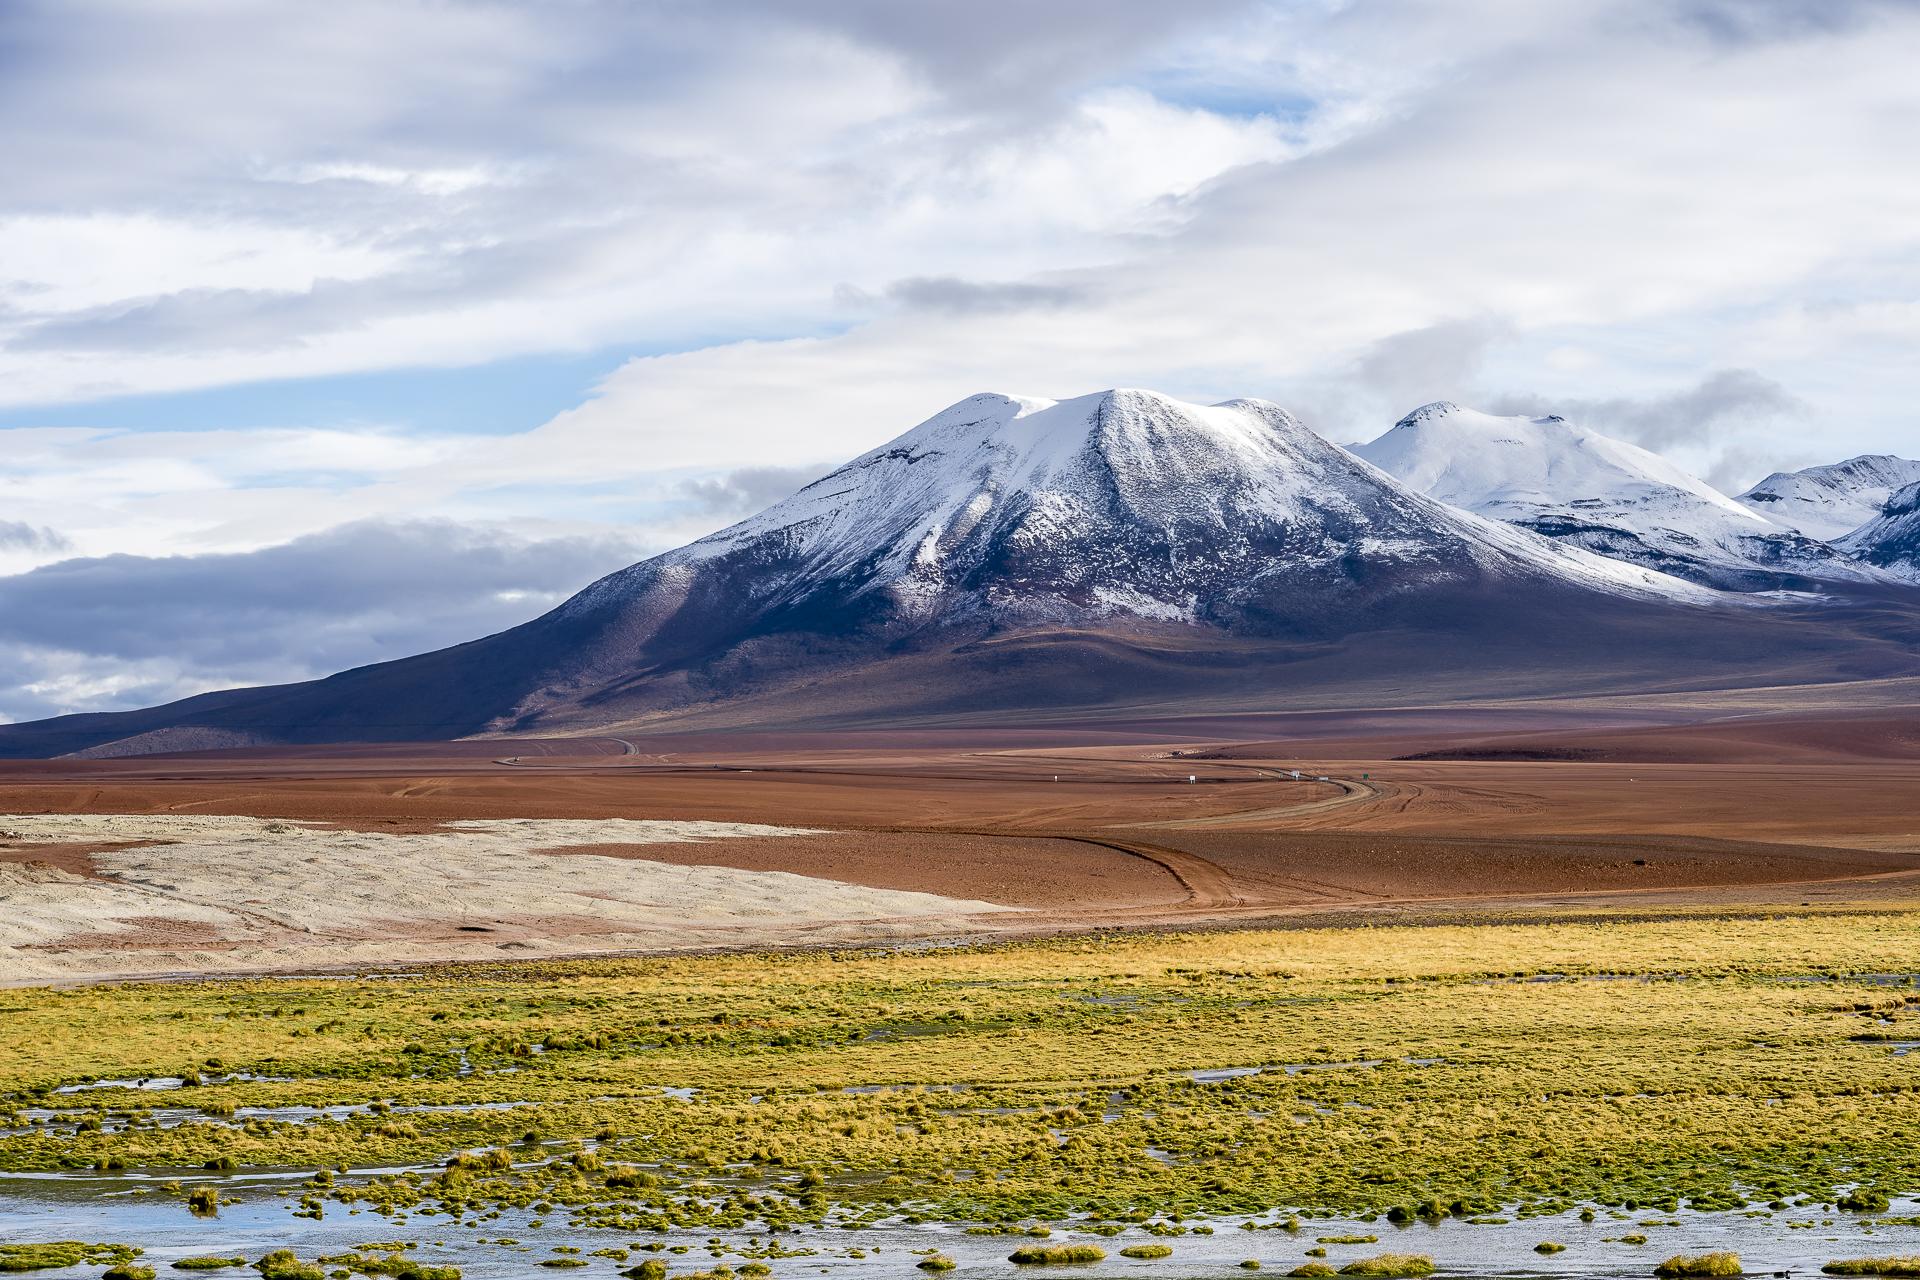 Altiplano San Pedro de Atacama